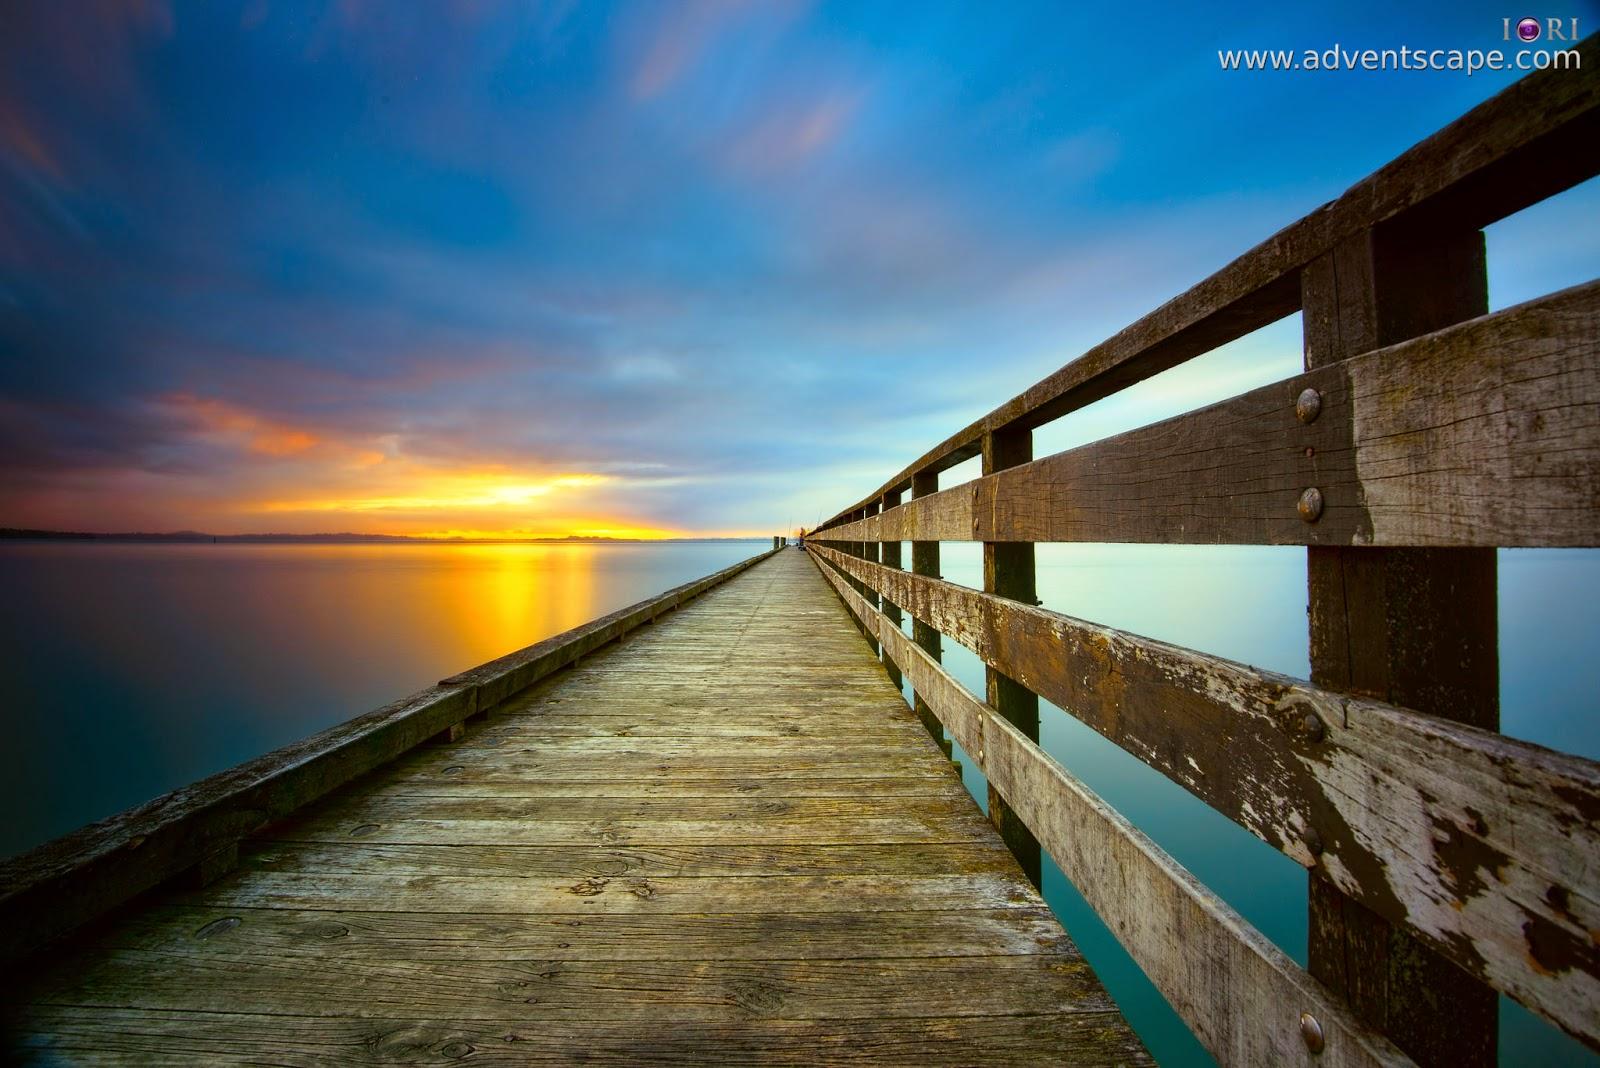 Philip Avellana, iori, adventscape, Cornwallis, jetty, seascape, landscape, North Island, New Zealand, fine art, sunrise, low angle